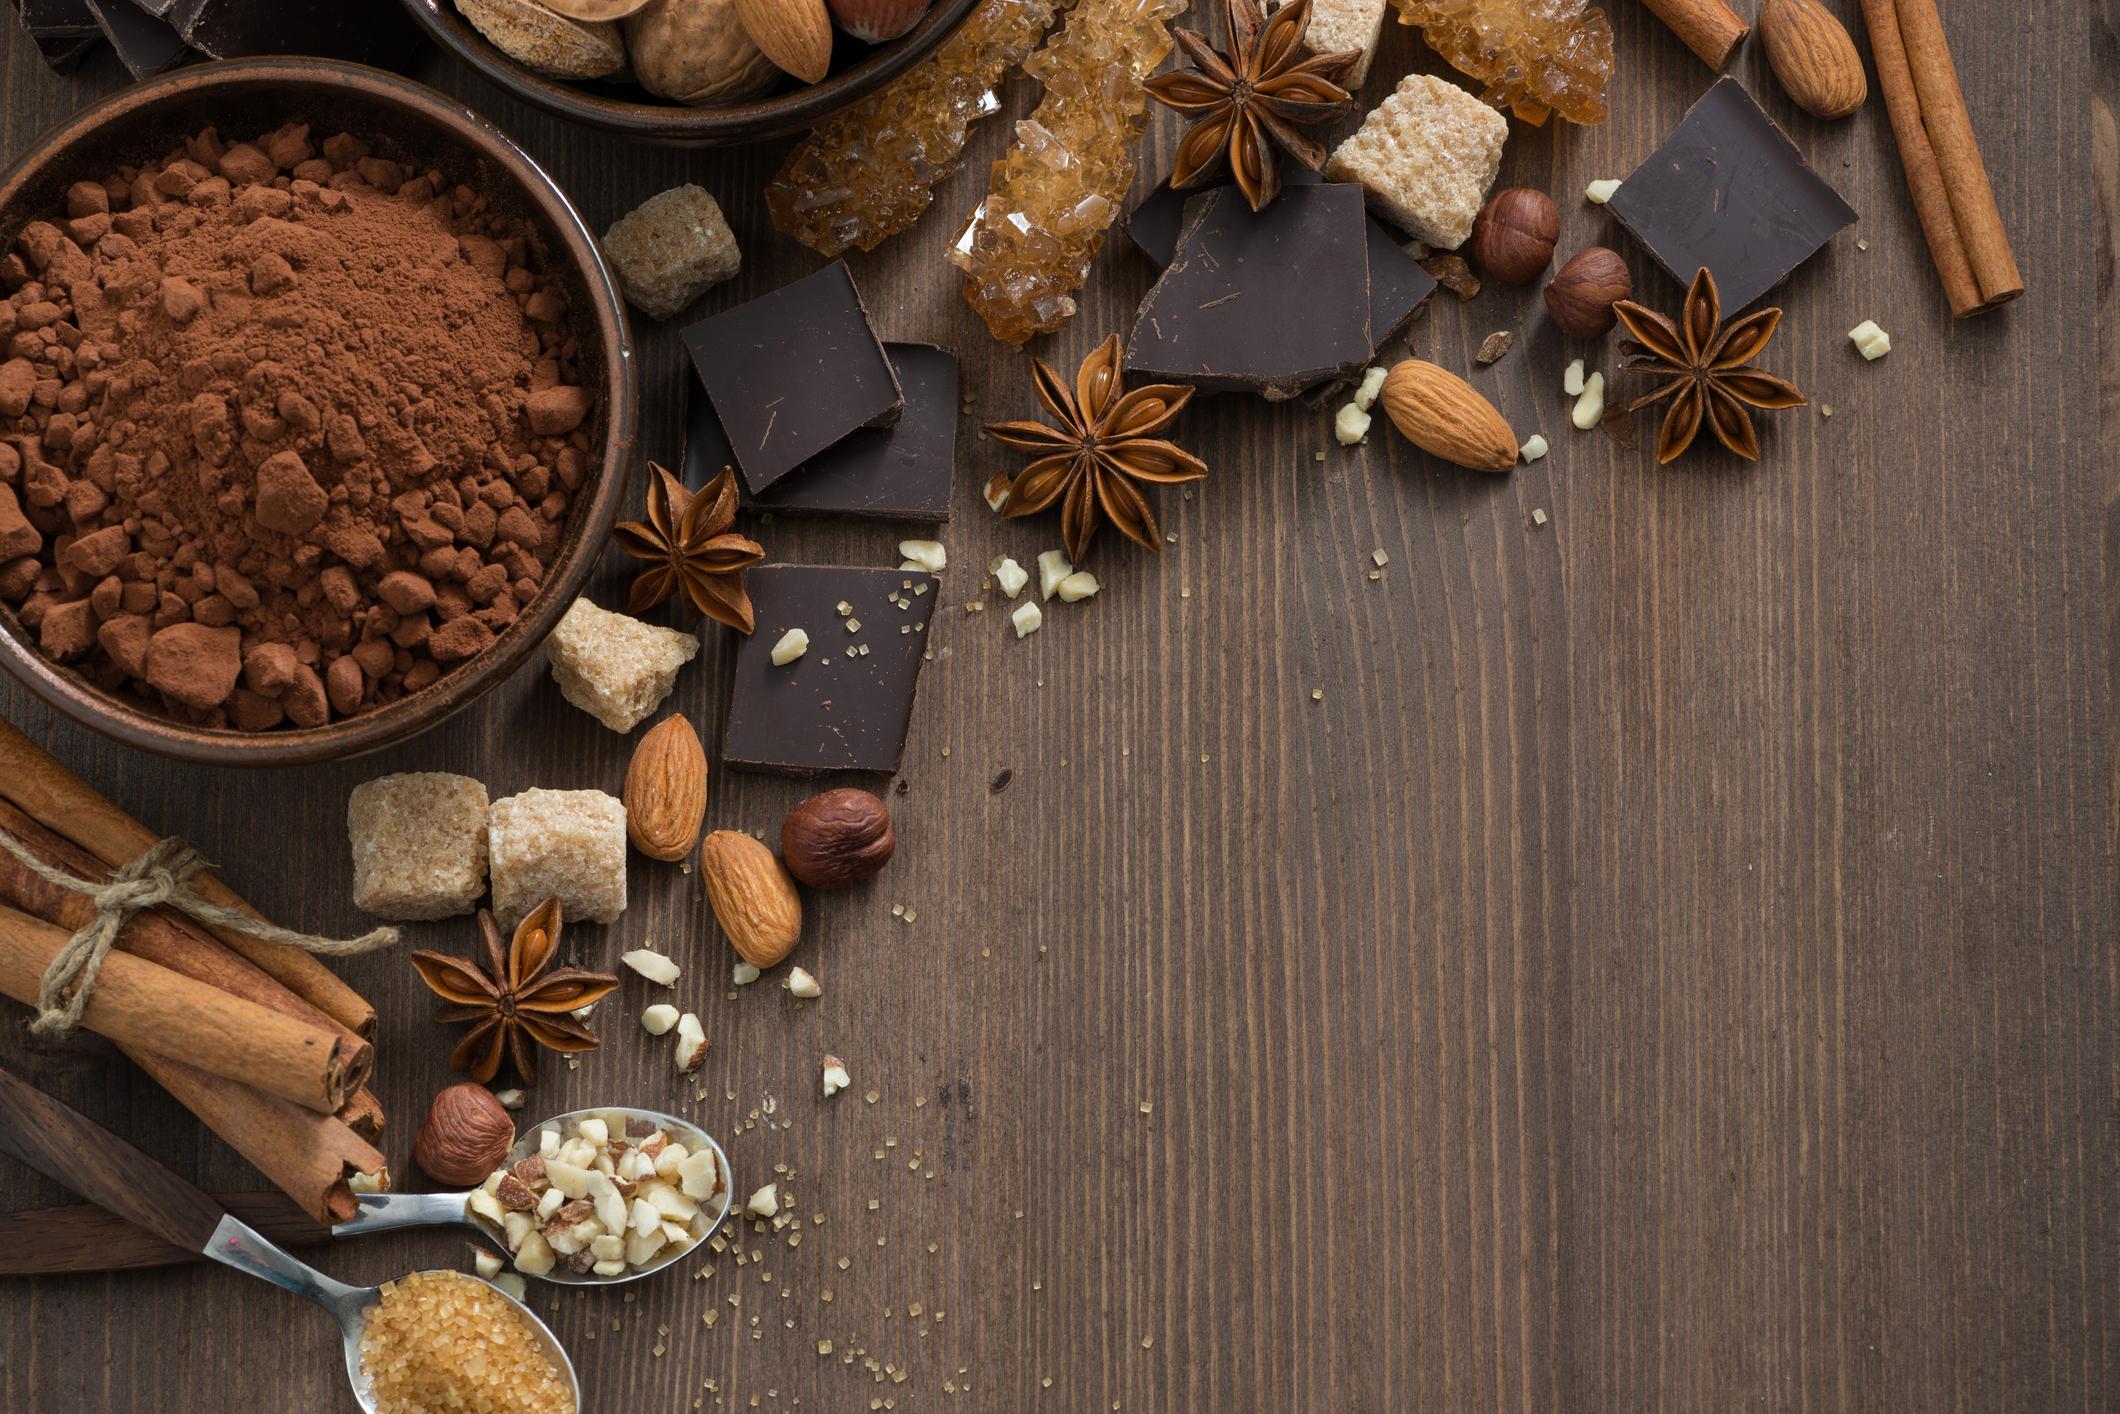 Tea Etc - Organic TeasKootenai Chai LatteLondon FogHot Chocolate